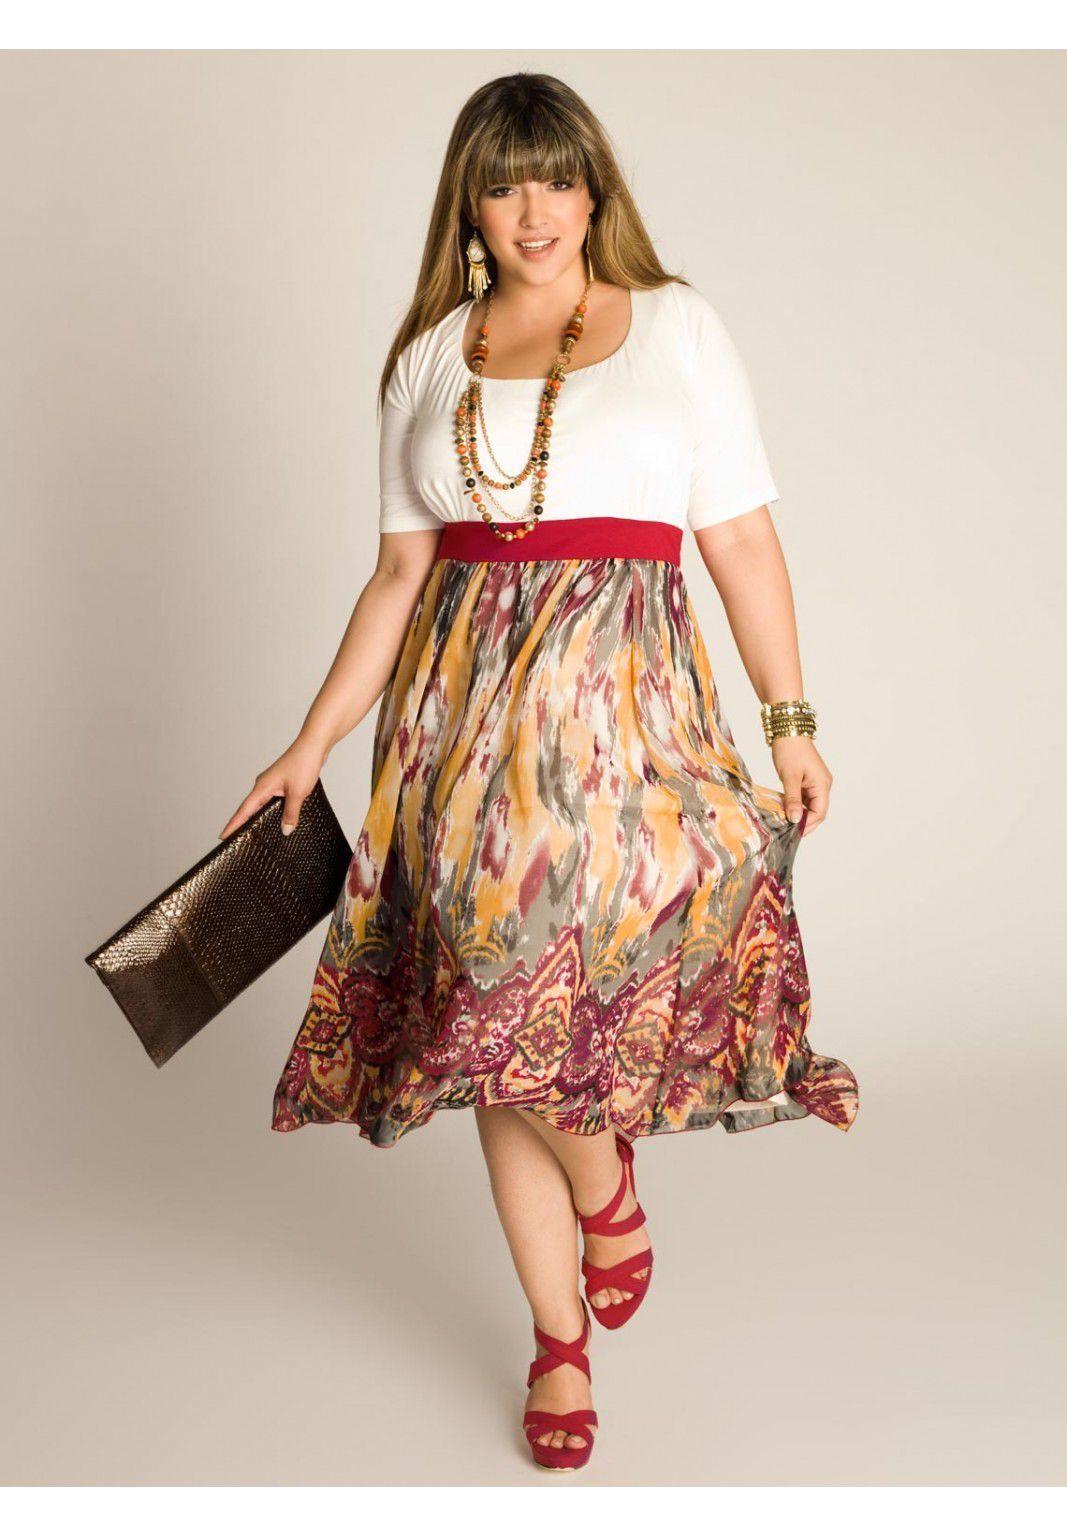 286a66c6e7e Namib Goddess Dress. Namib Goddess Dress Plus Size ...